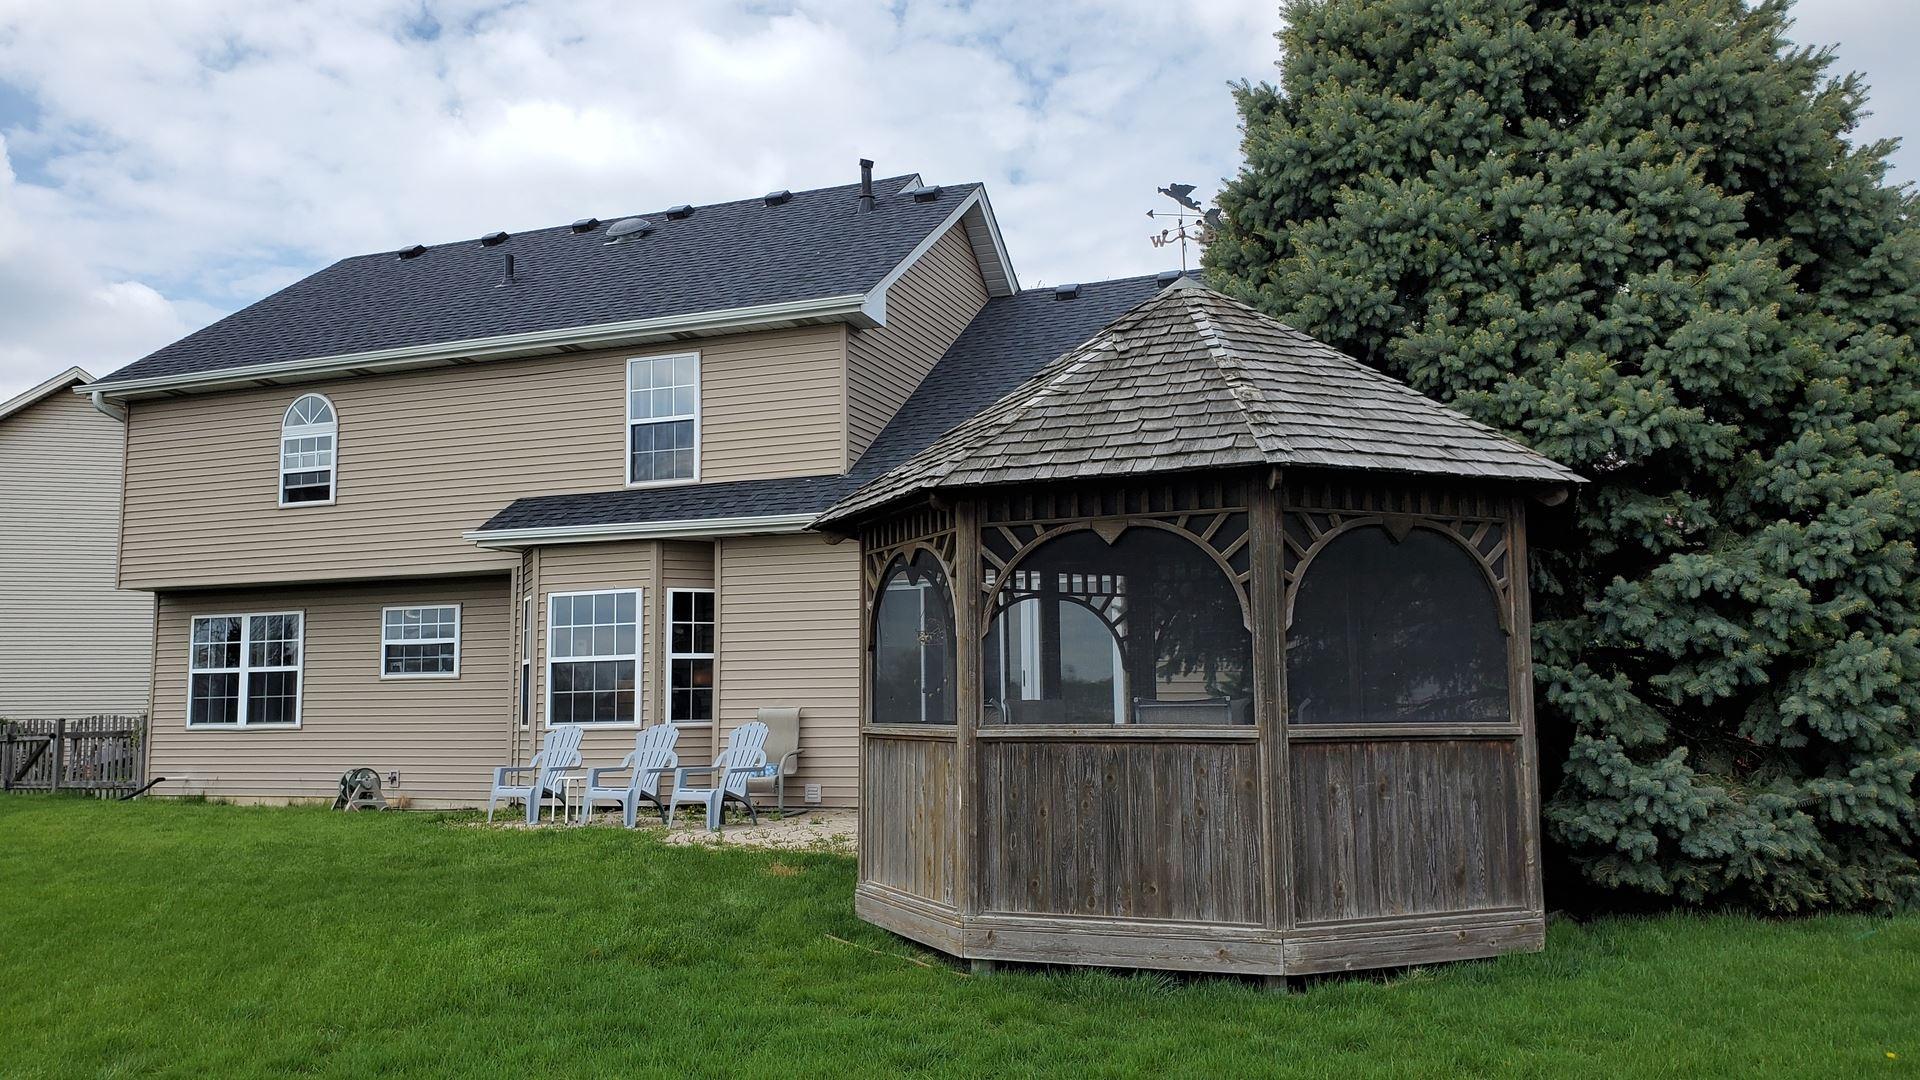 Photo of 208 Long Meadow Court, Oswego, IL 60543 (MLS # 11072009)